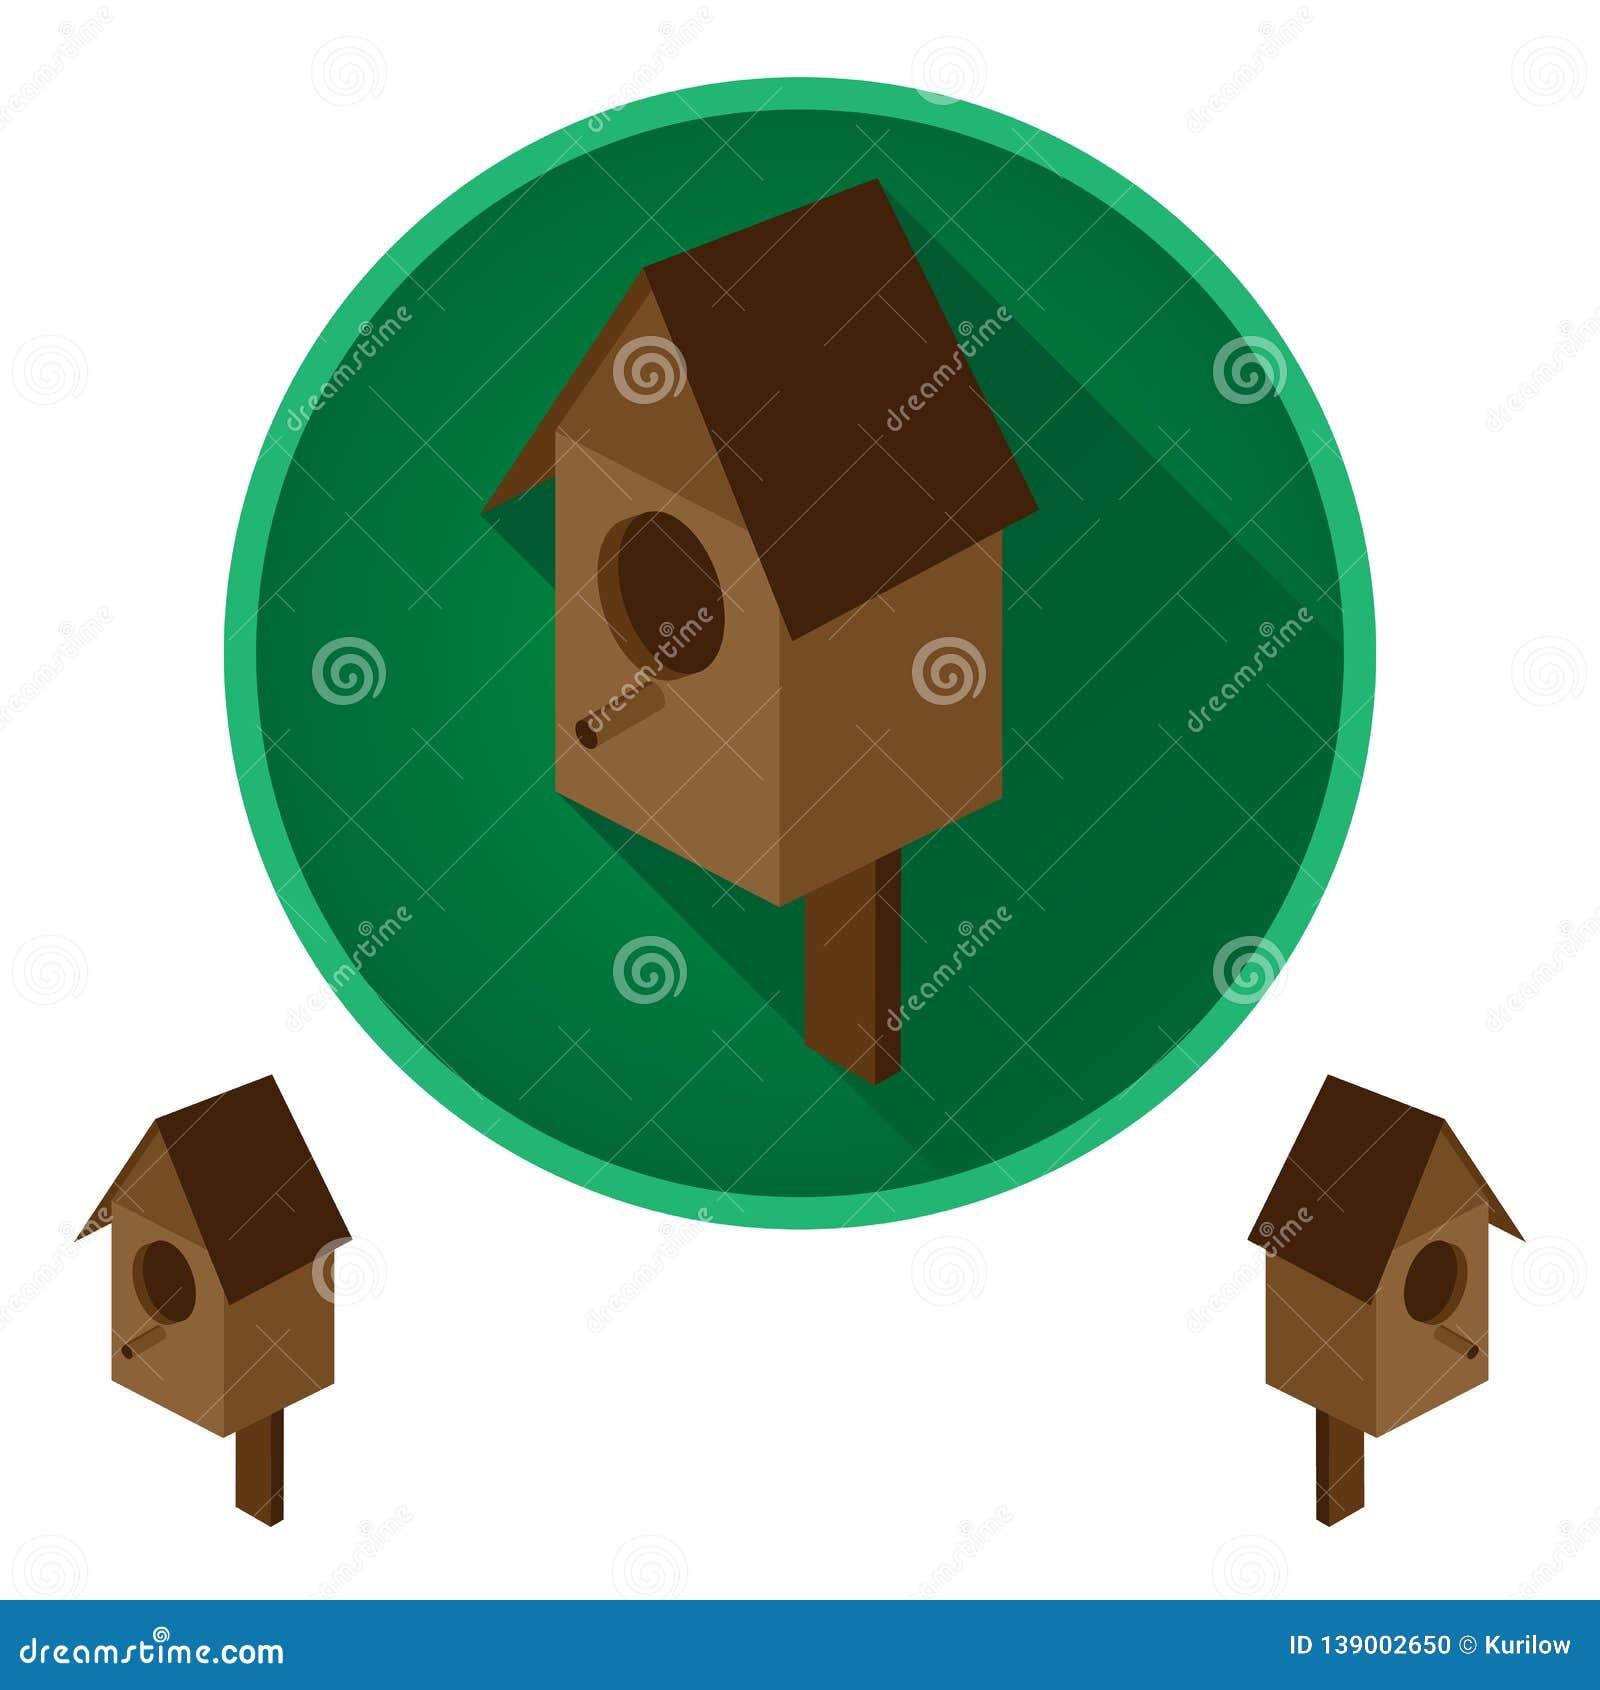 Birdhouse Icon On White Background. House For The Birds ... on modern birdhouse designs, mosaic birdhouse designs, cute birdhouse designs, exotic birdhouse designs, awesome birdhouse designs, unusual birdhouse designs, interesting birdhouse designs, whimsical birdhouse designs, ornate birdhouse designs, creative birdhouse designs,